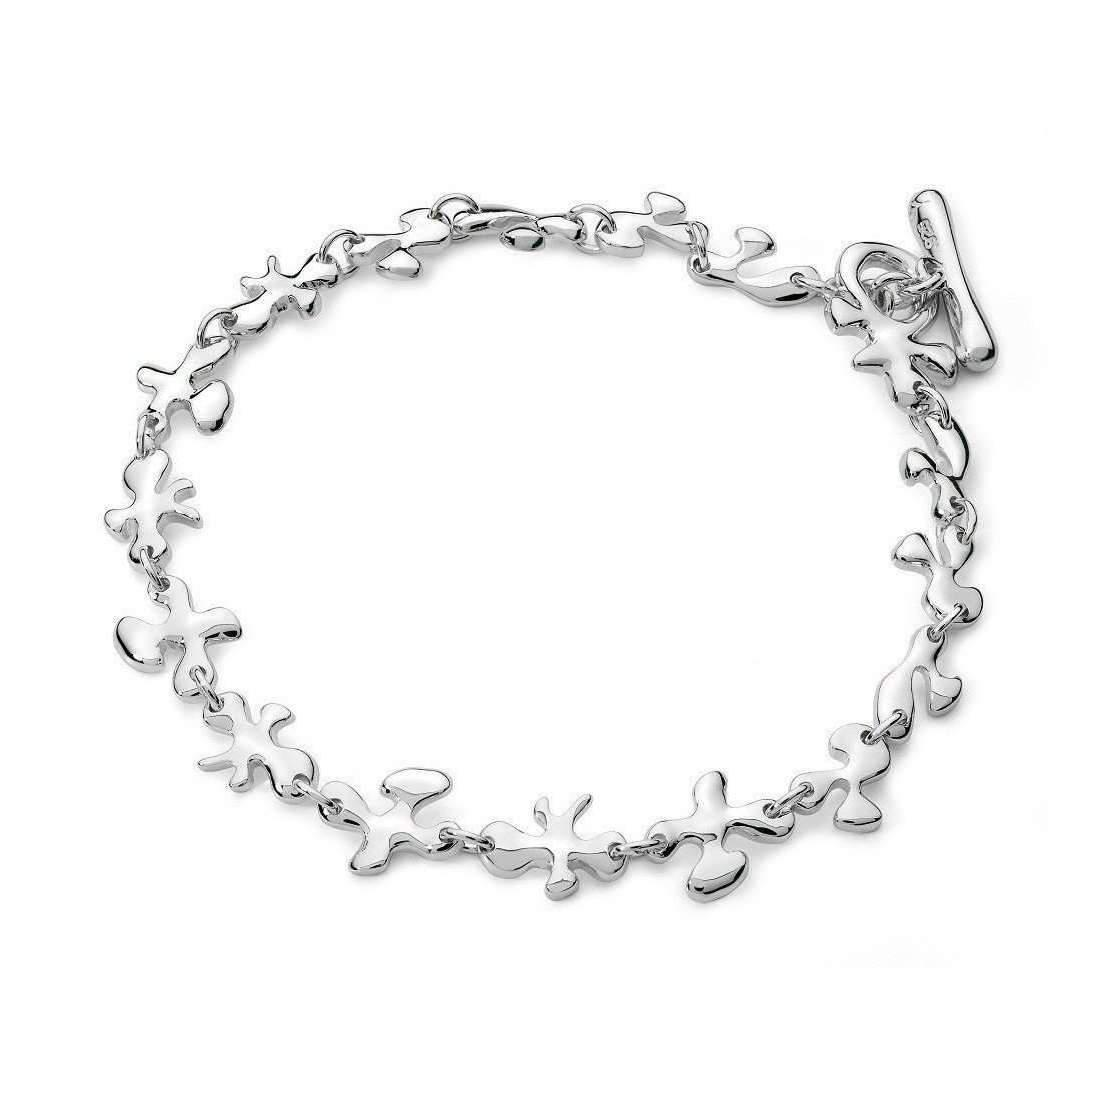 Lucy Quartermaine Dancing Drop Bracelet 3XIgsA